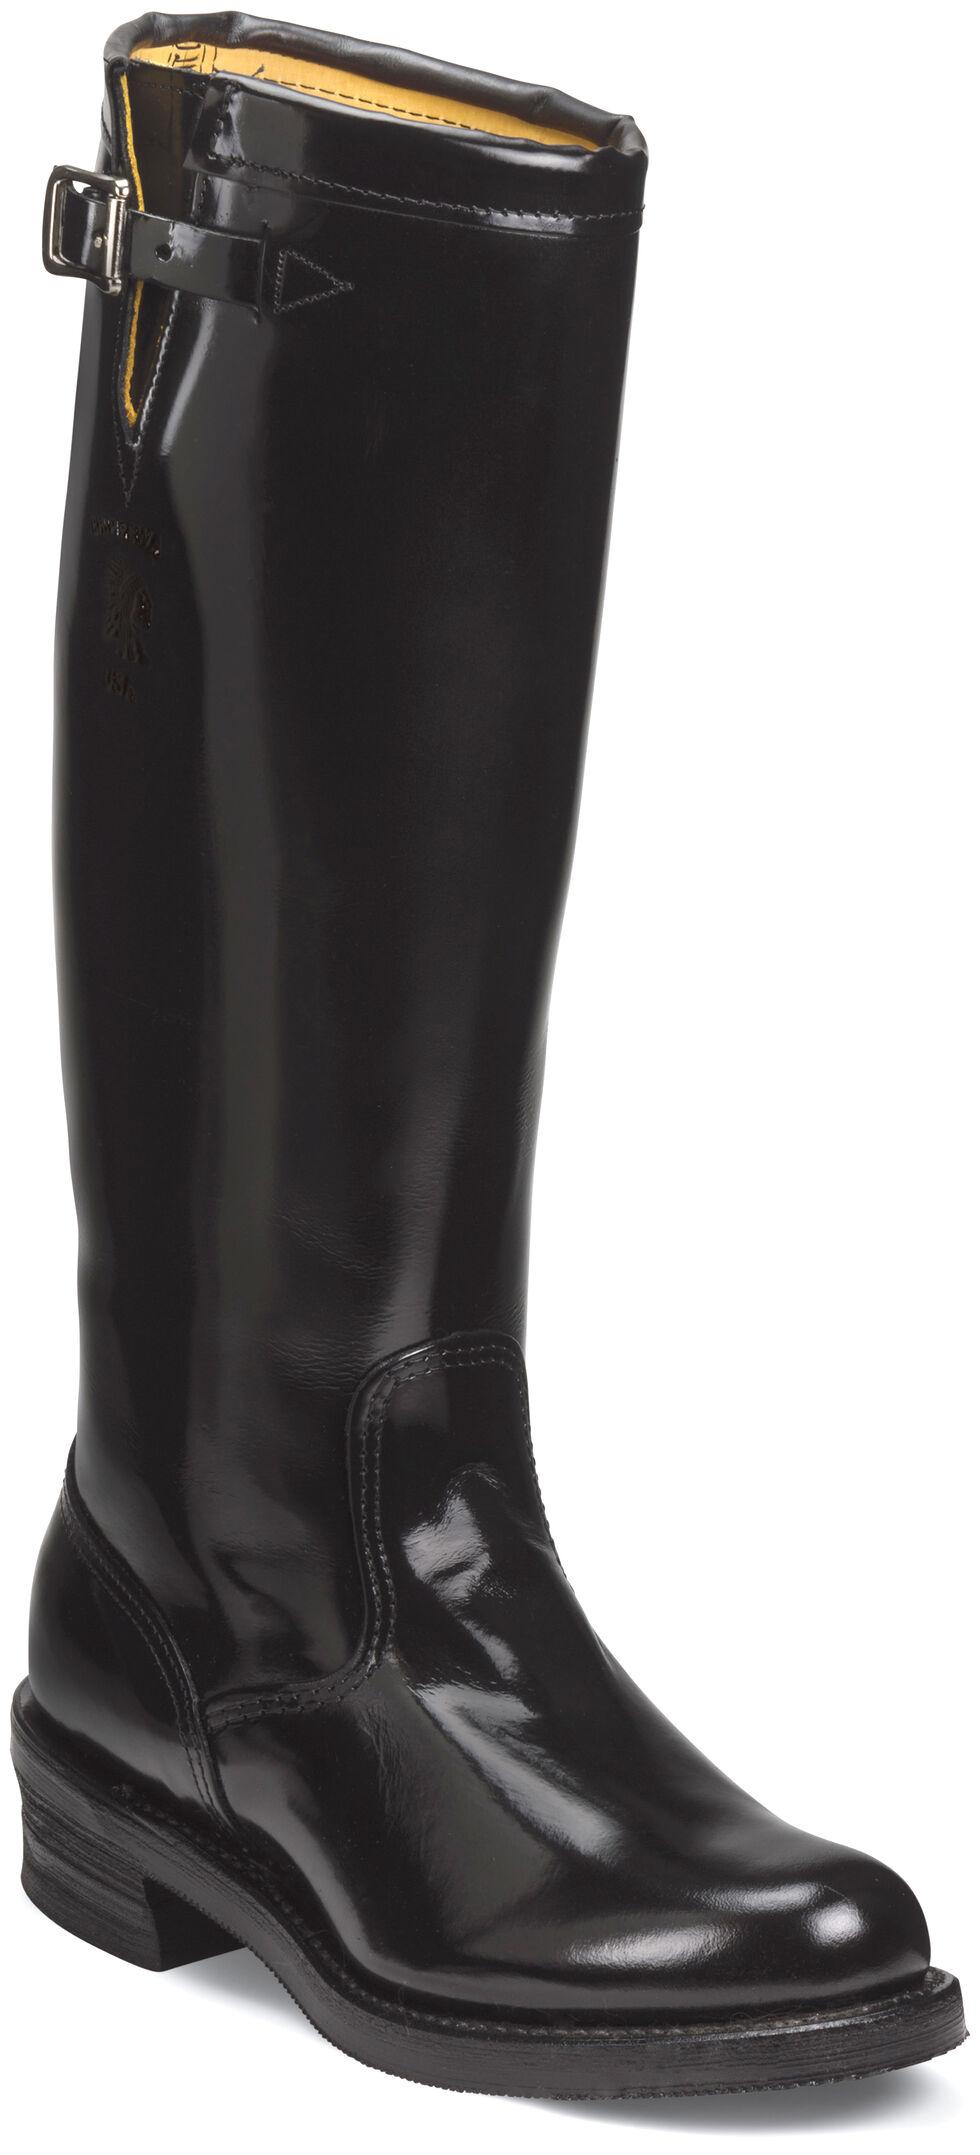 "Chippewa Men's 17"" Strapless Trooper Boots - Round Toe, Black, hi-res"